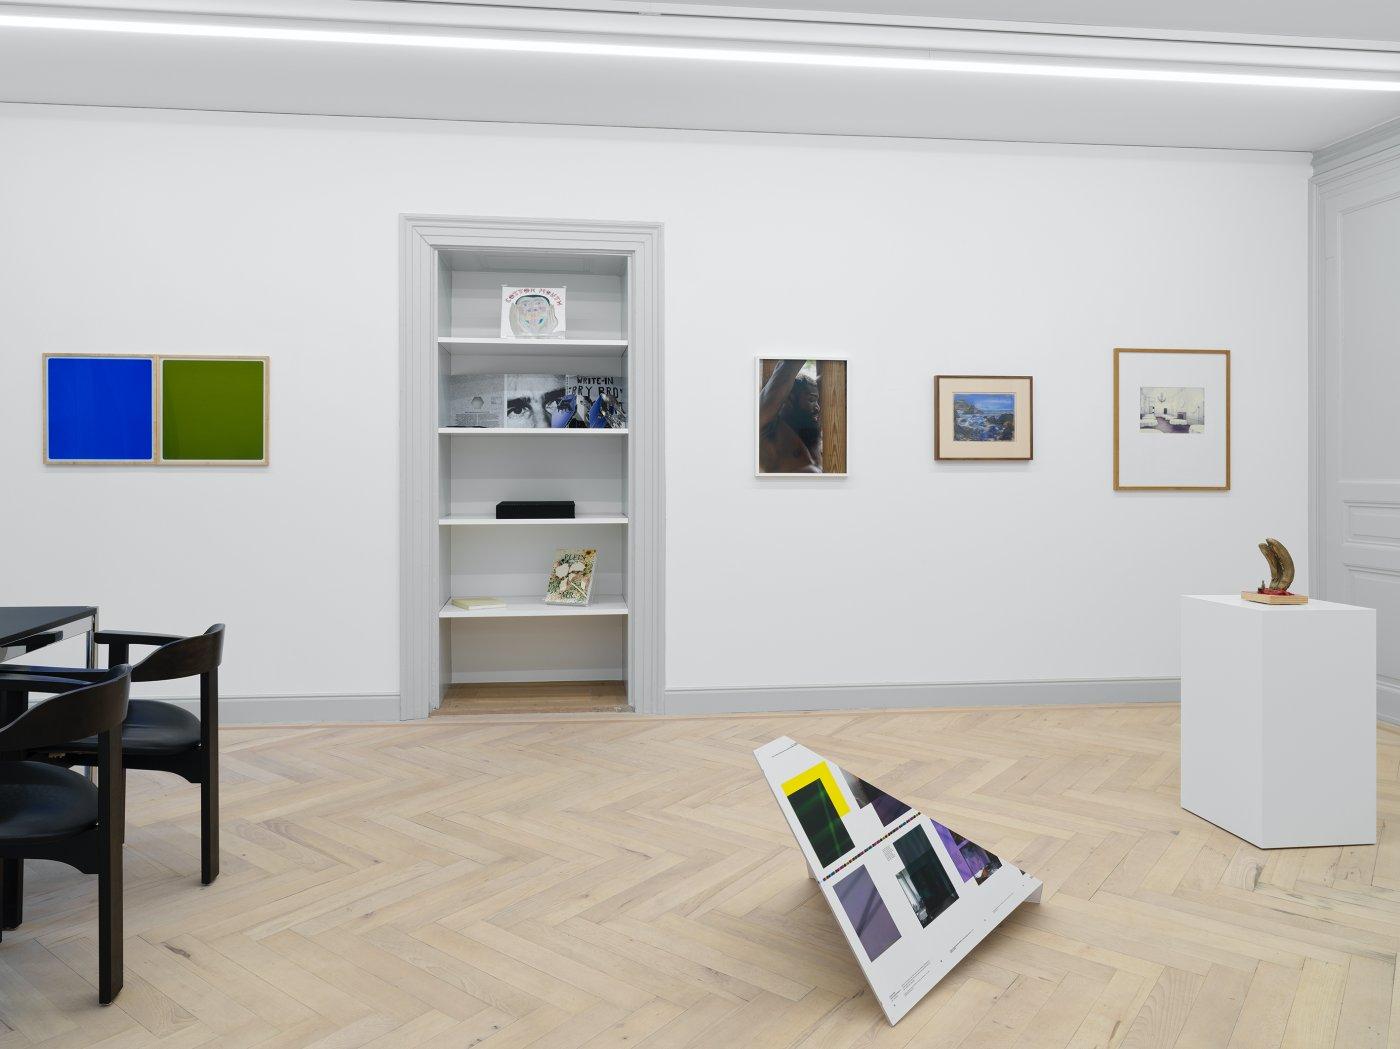 Galerie Eva Presenhuber All in One 12